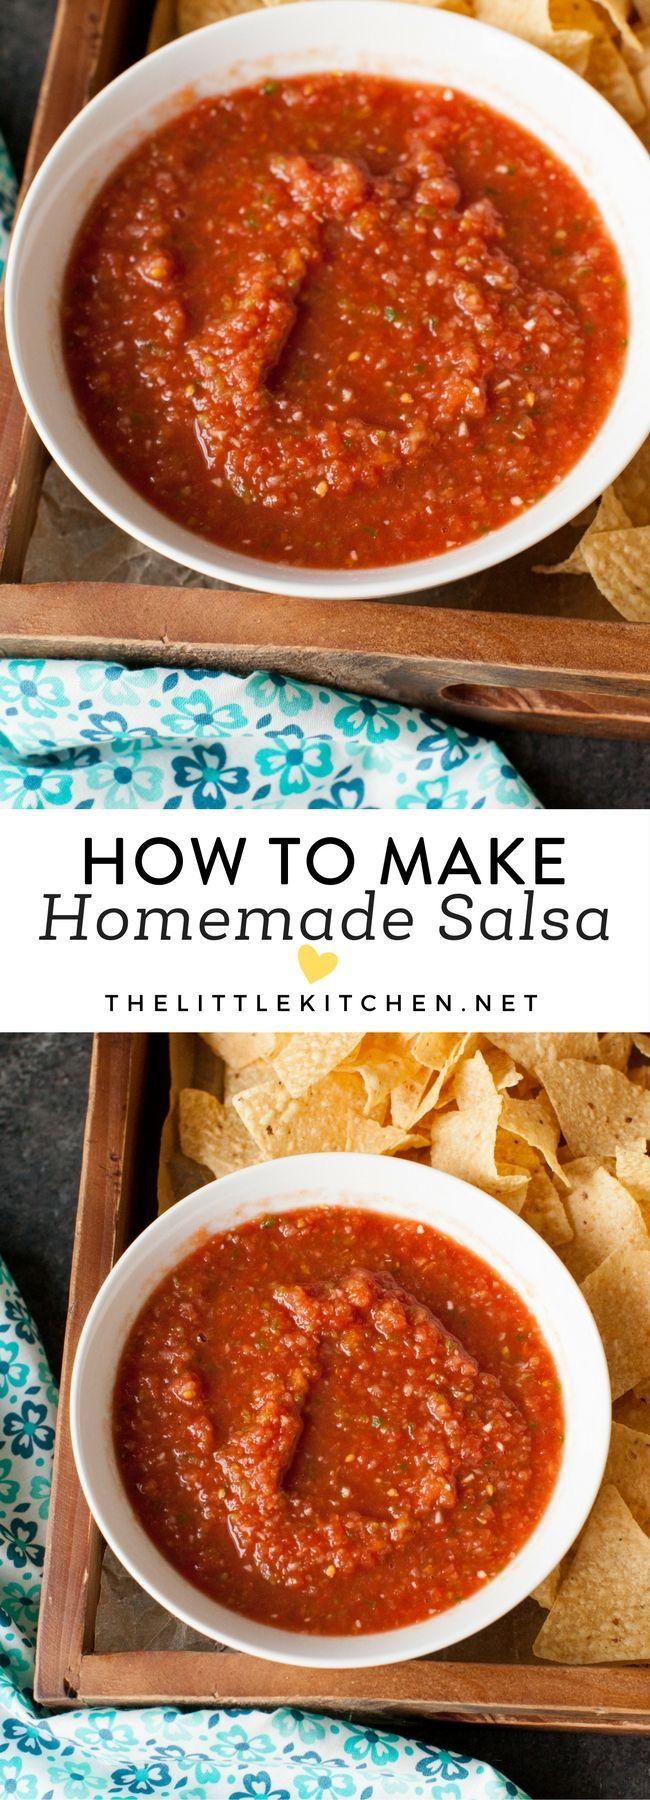 How to make salsa from thelittlekitchen.net @TheLittleKitchn